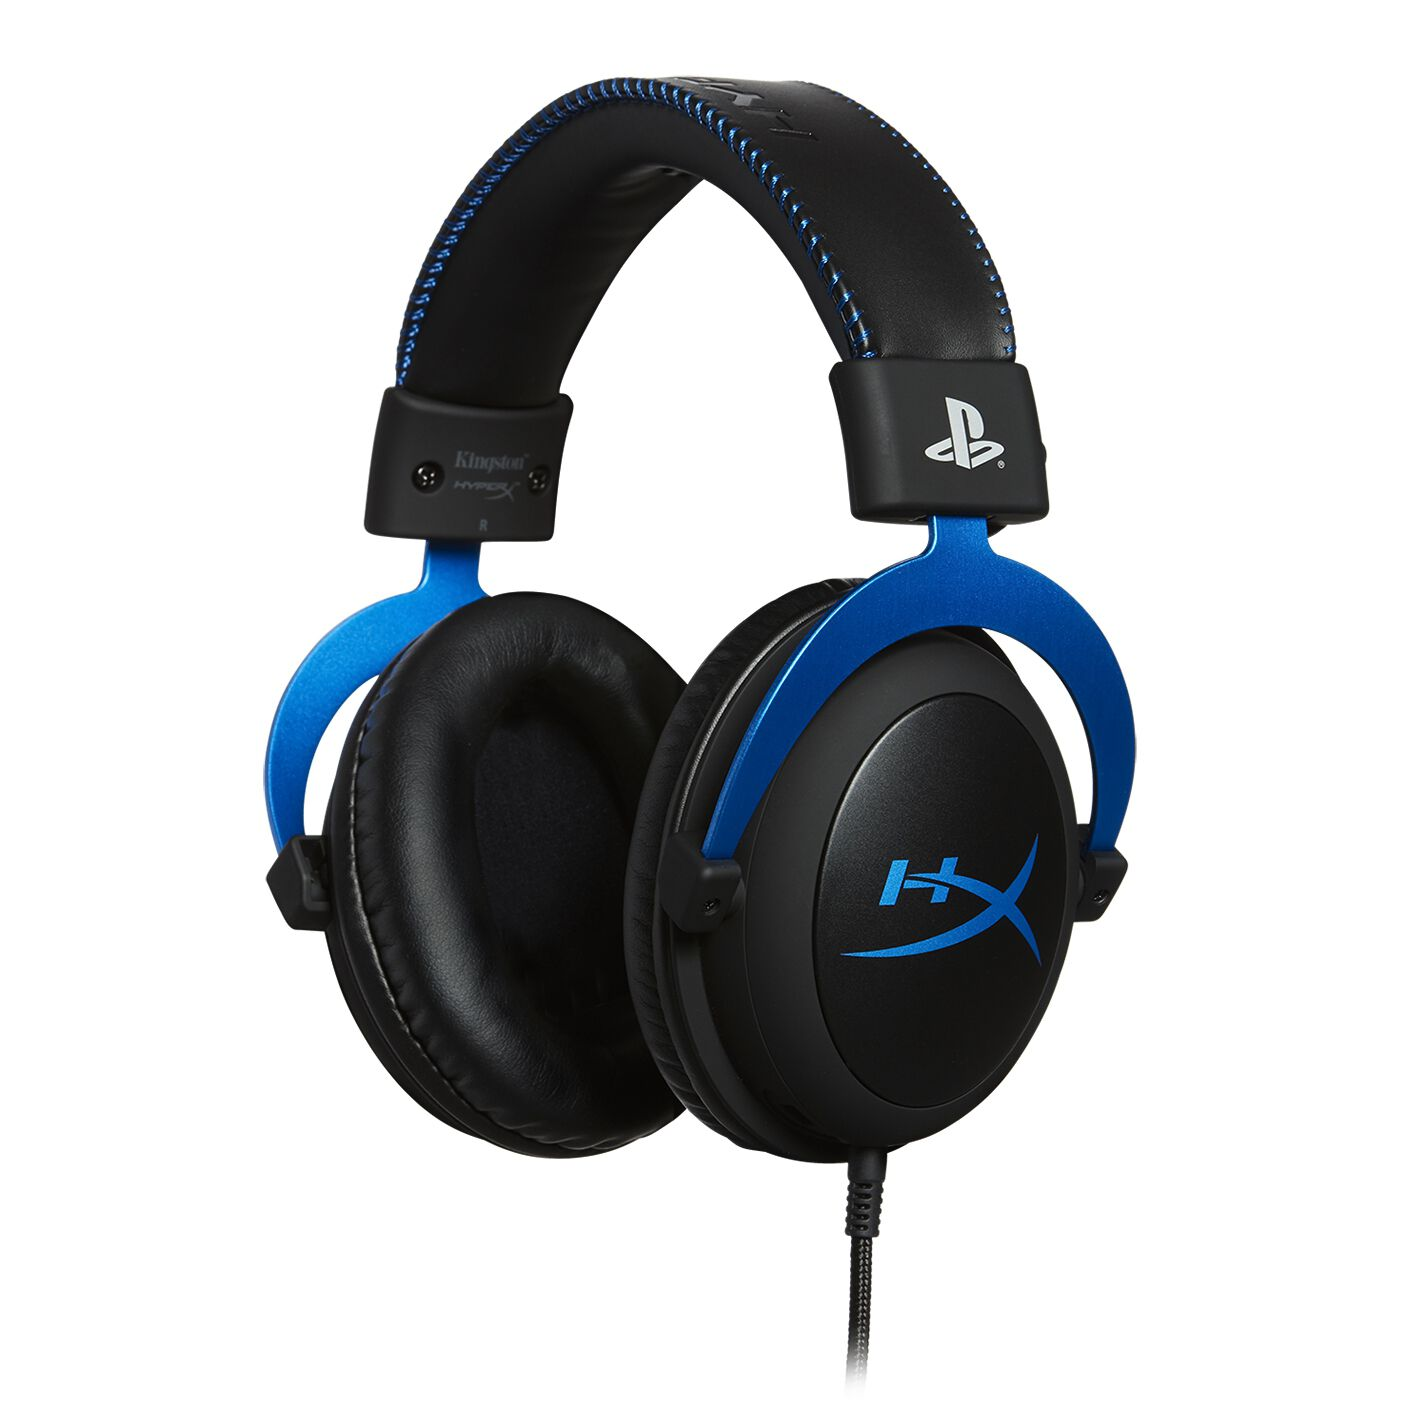 casque sony bleu et noir micromania